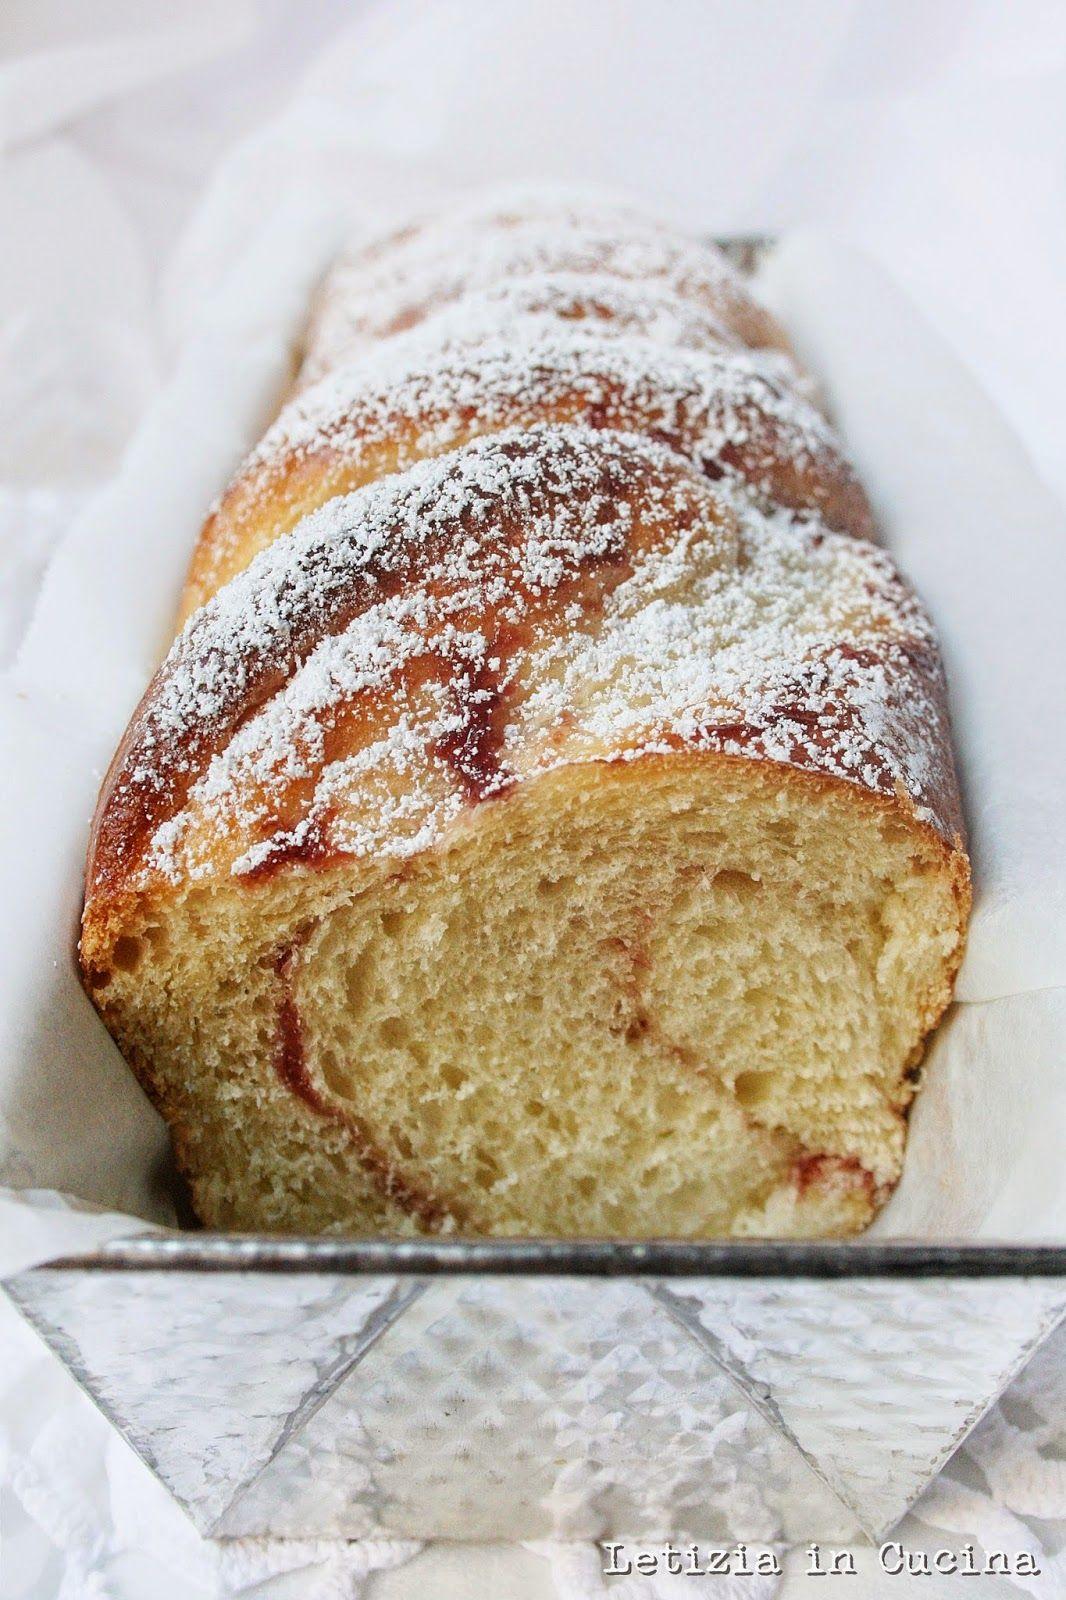 Letizia in Cucina: PanBrioche alla Marmellata a lievitazione ...